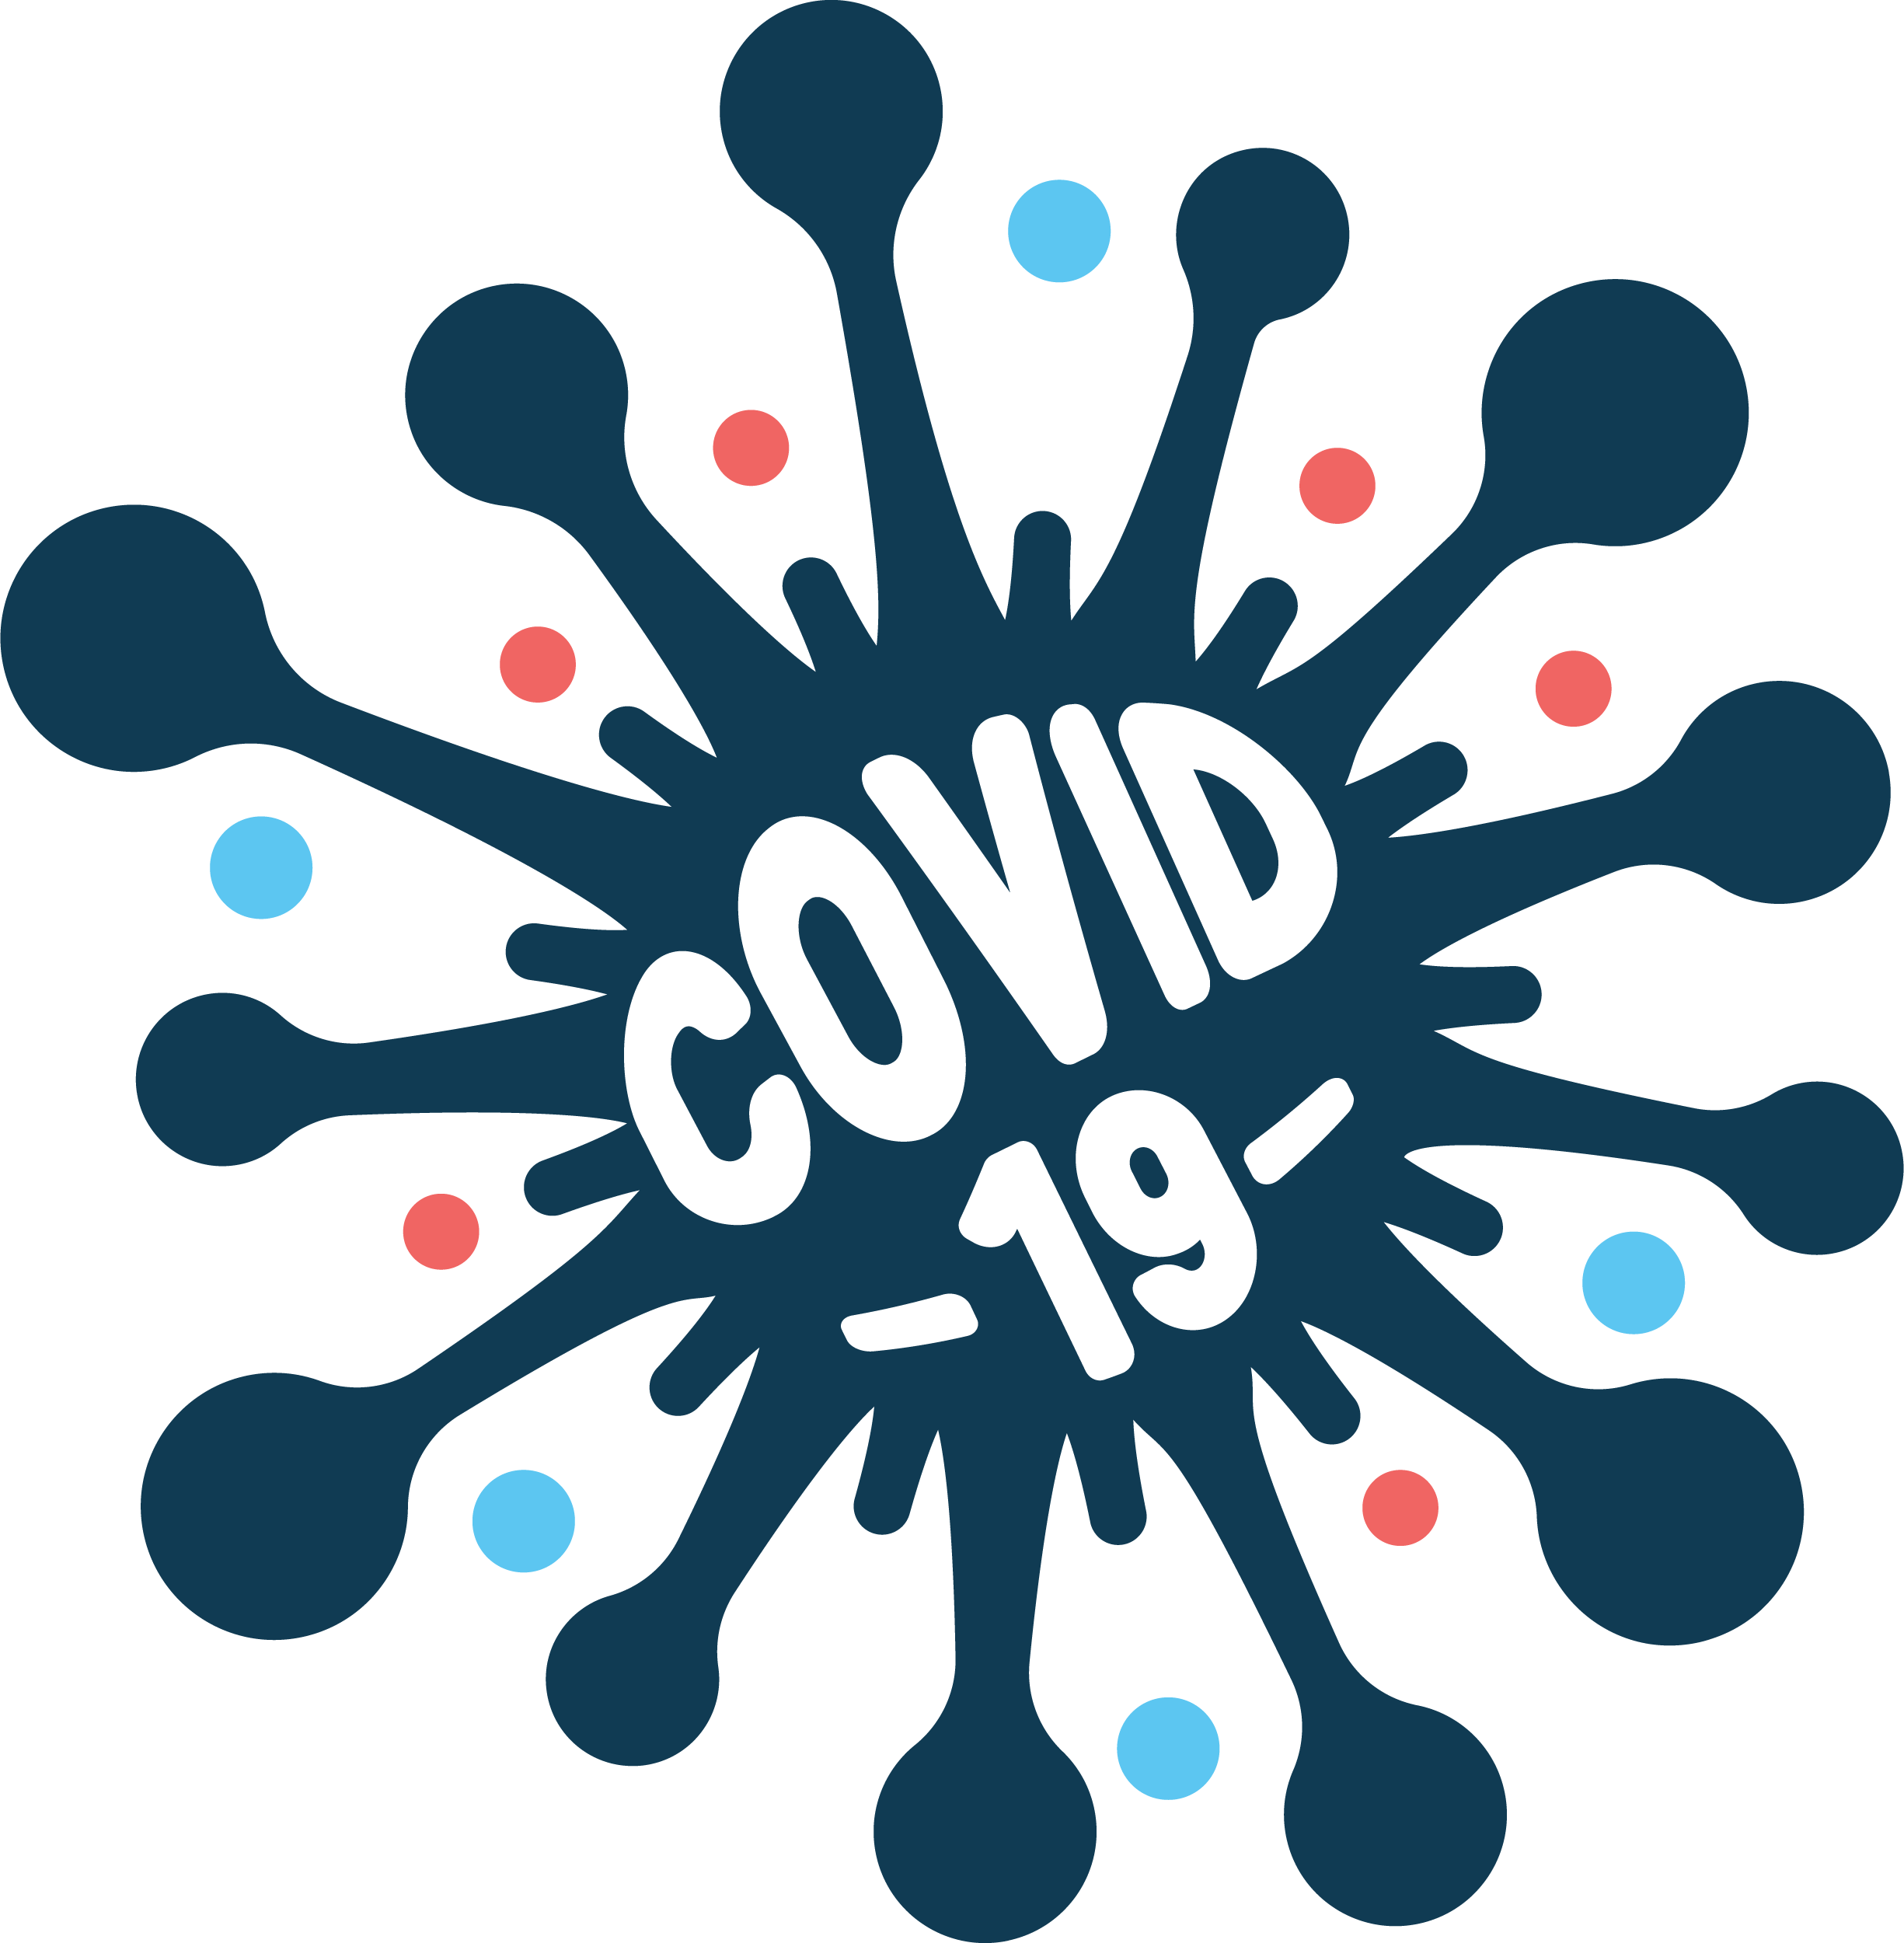 Coronavirus Disease covid-19 Blue Free DXF File